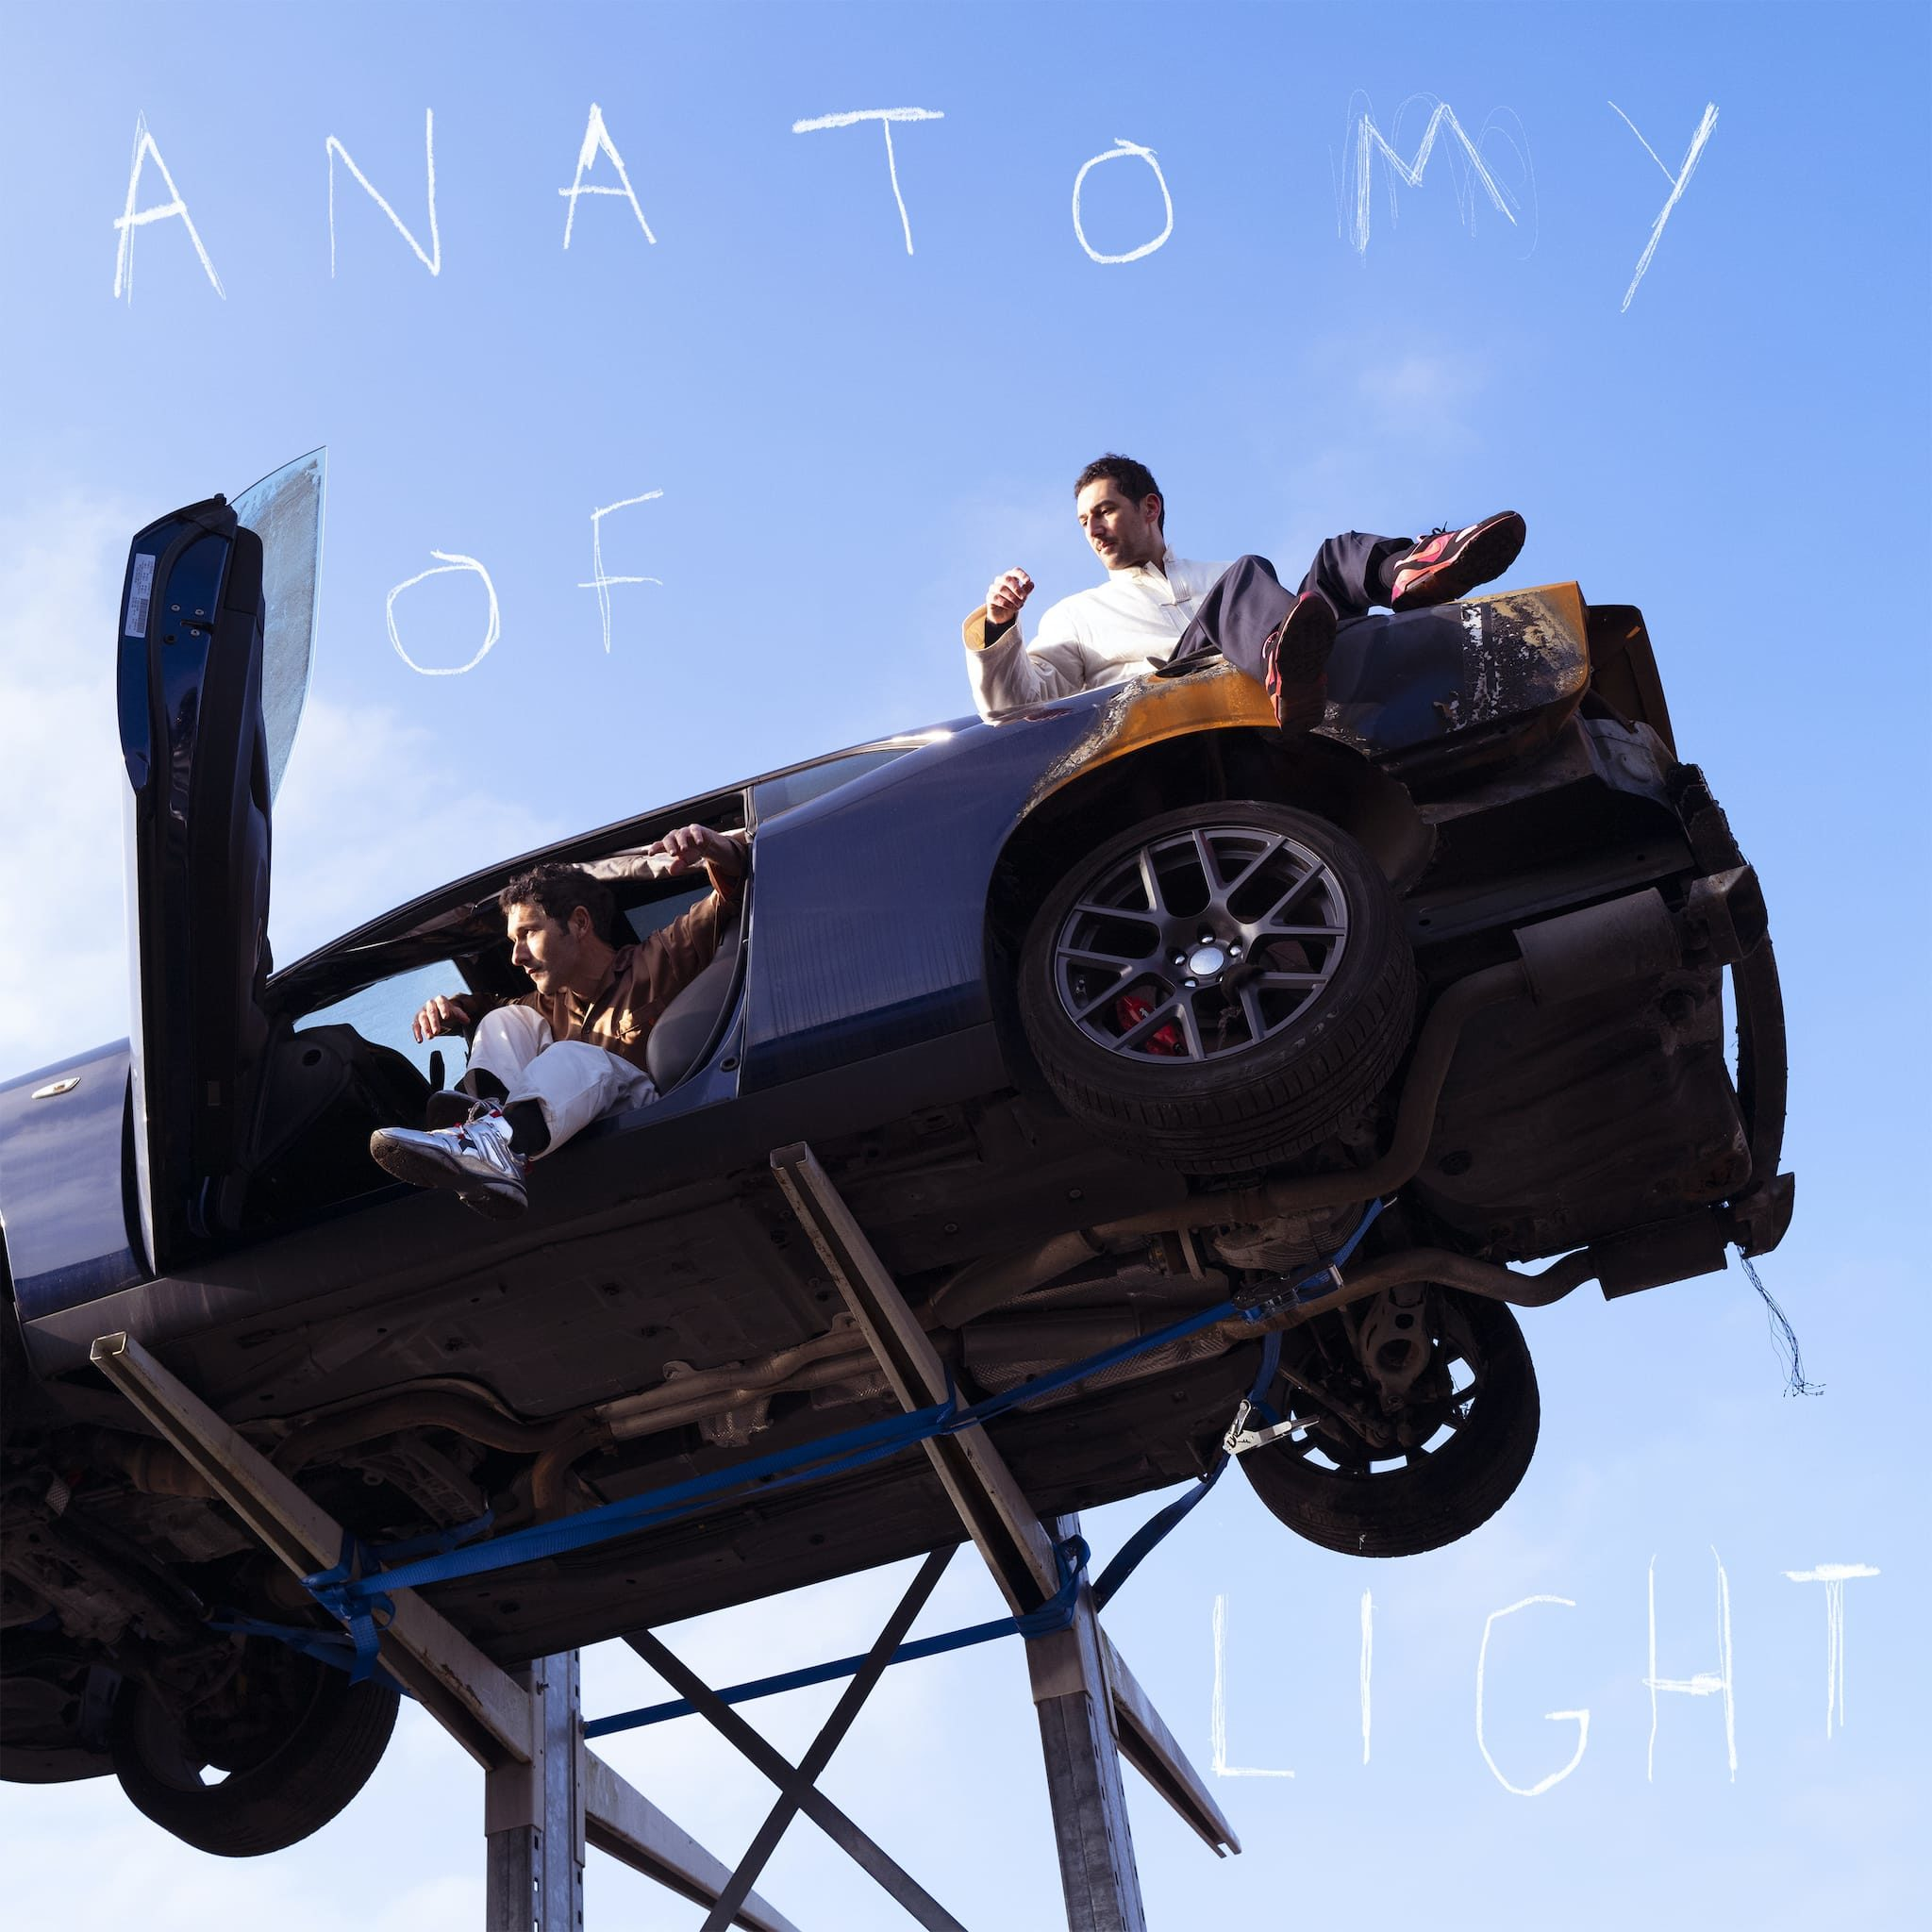 AaRON cover album anatomy of light music